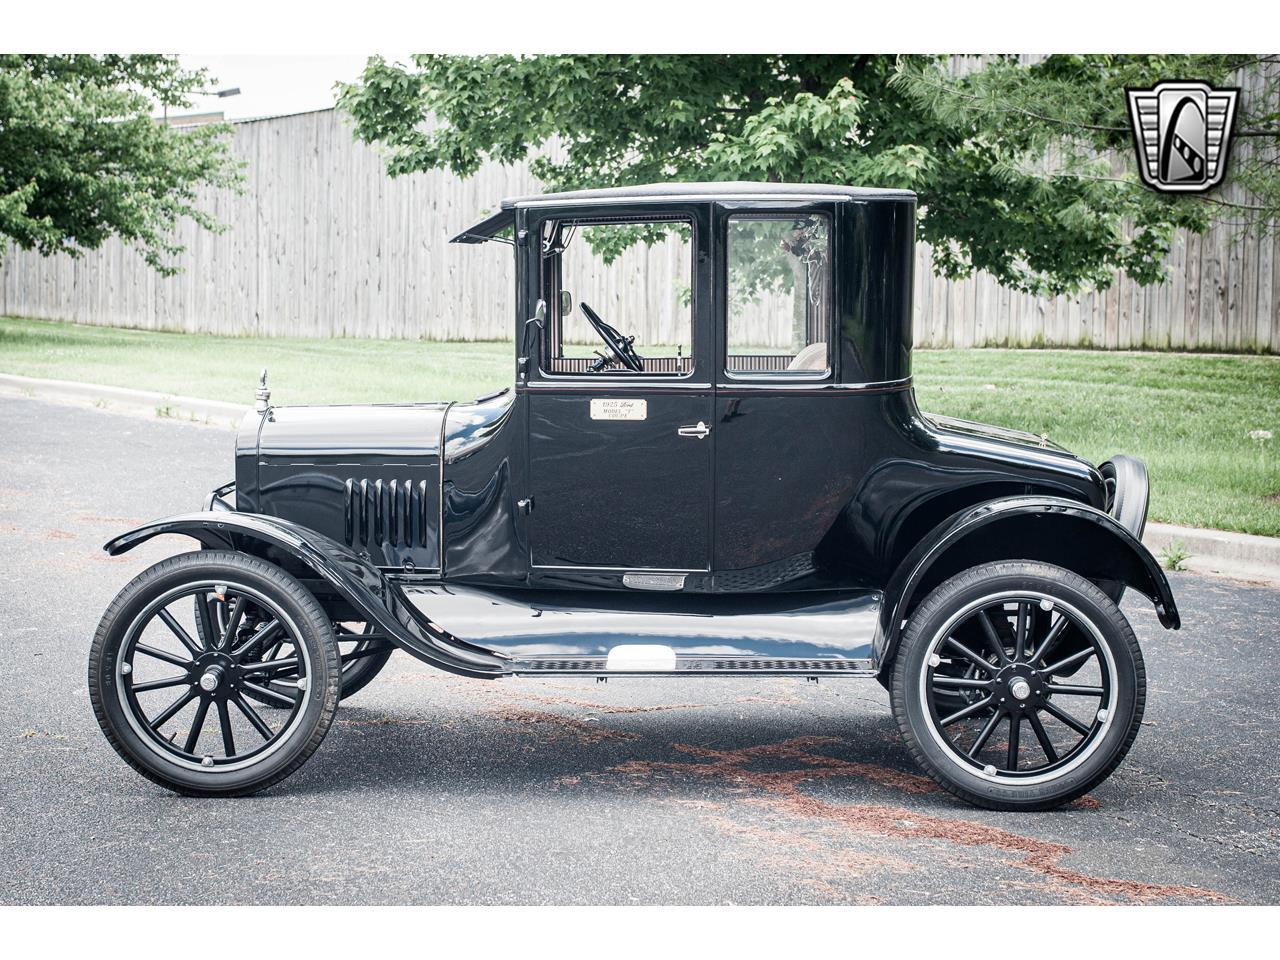 Large Picture of Classic 1925 Model T located in O'Fallon Illinois - $18,000.00 - QB96